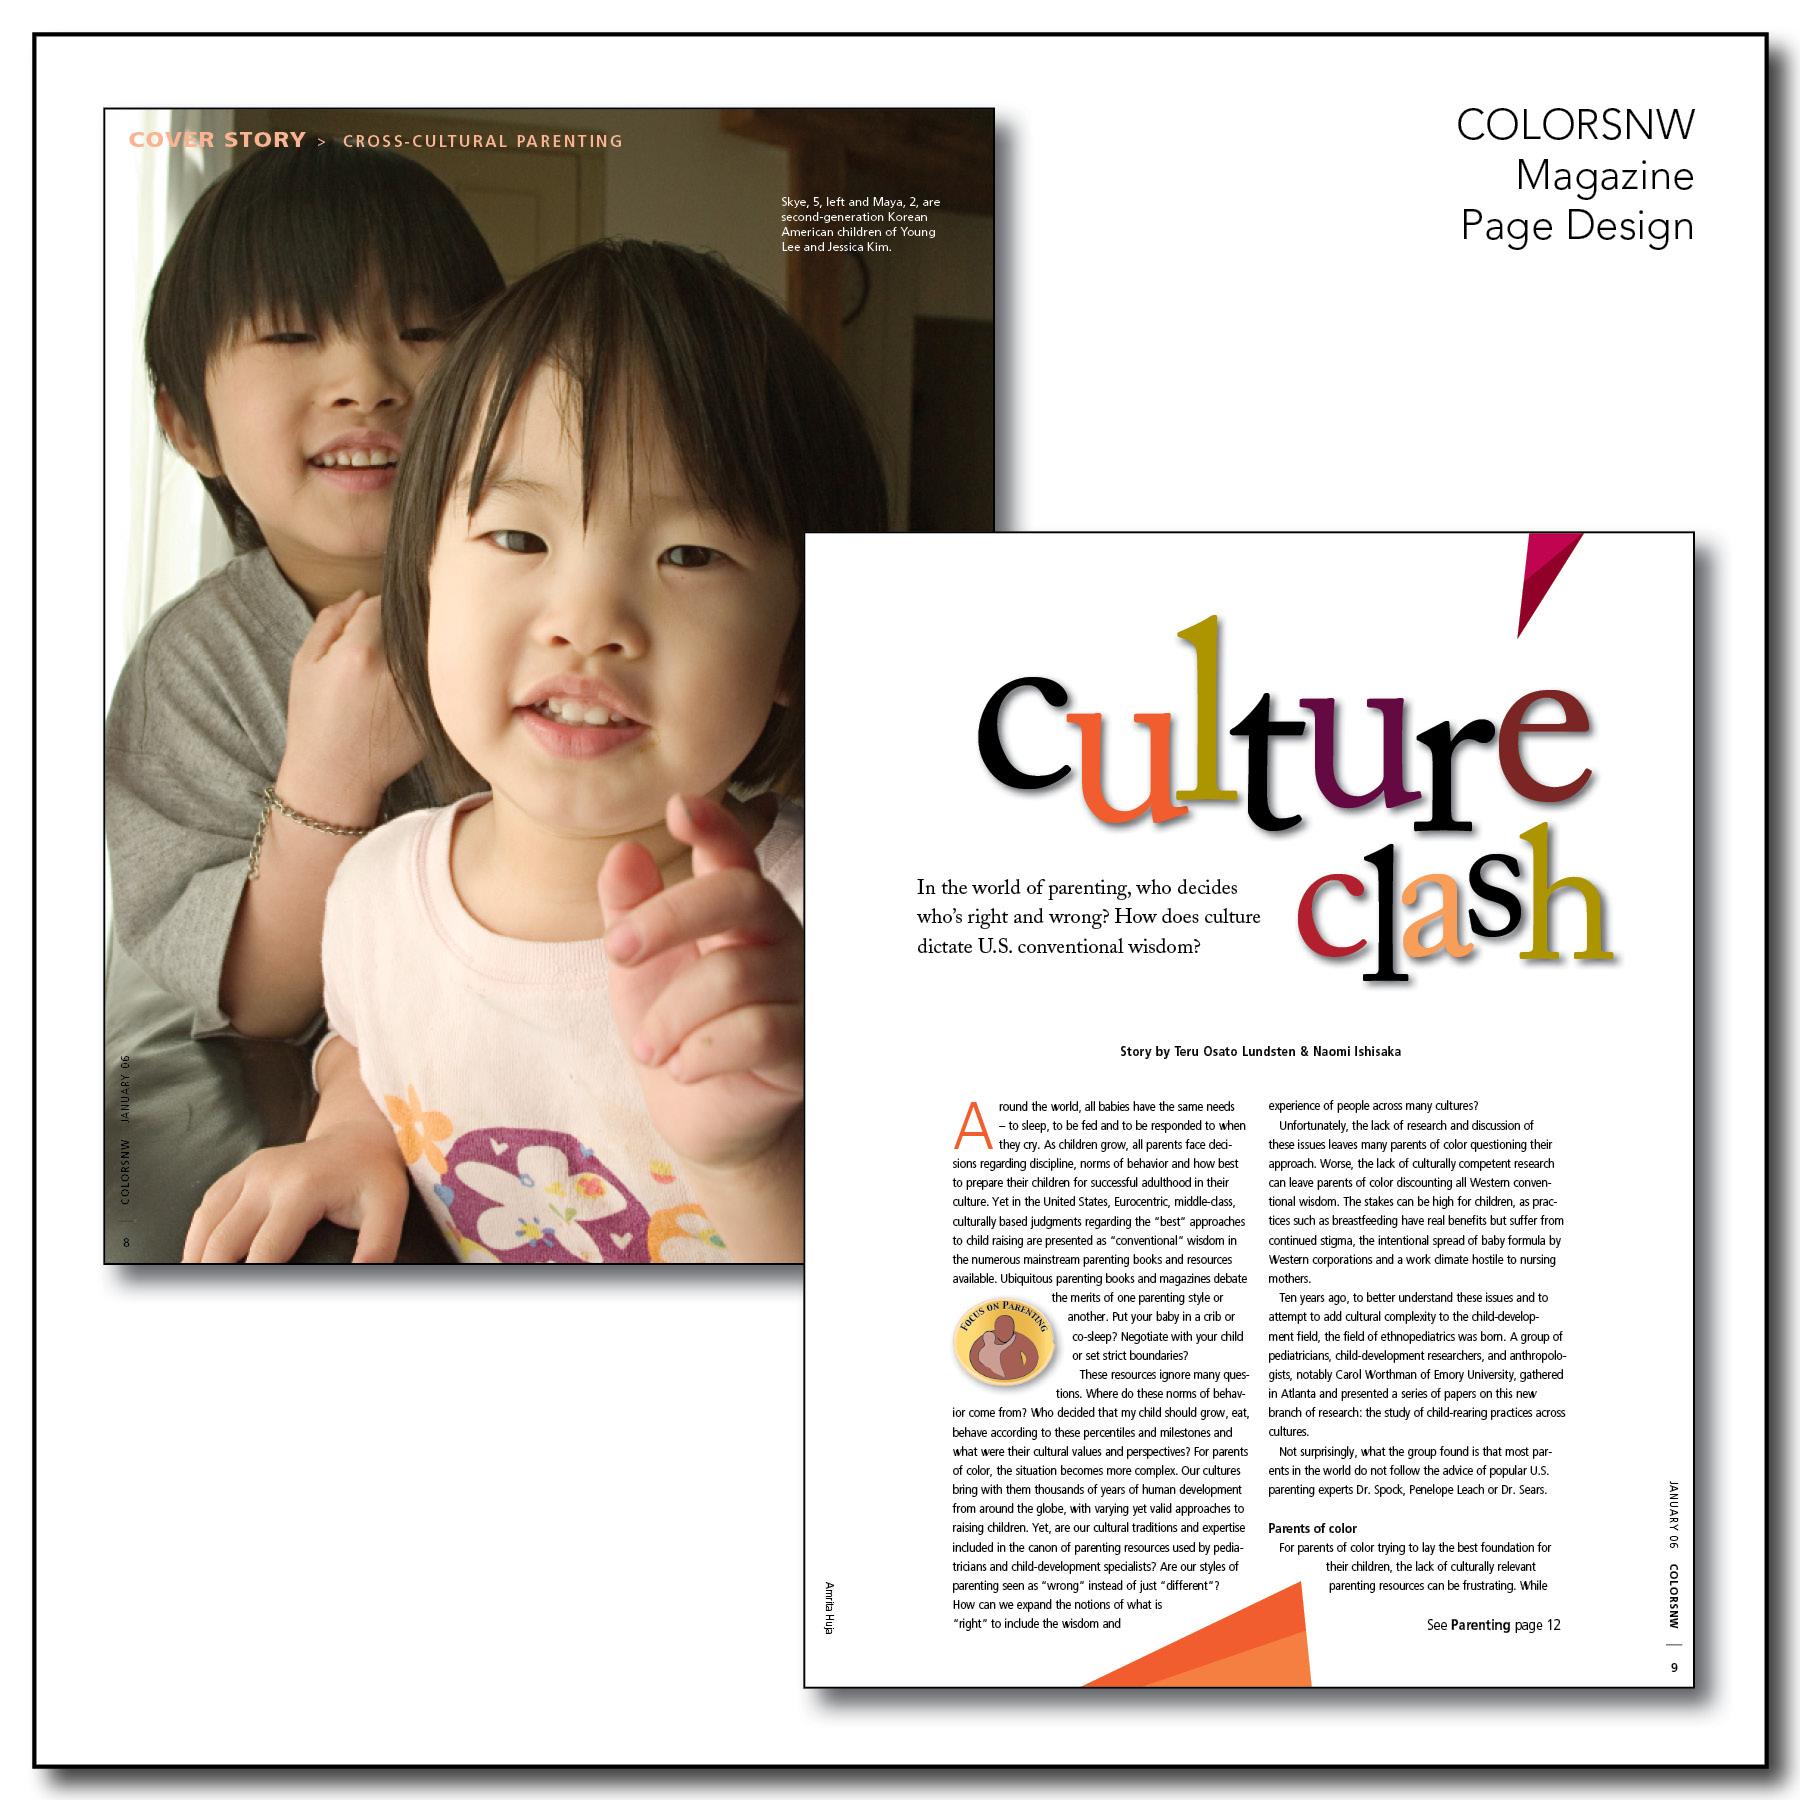 Page design colorsnw magazine